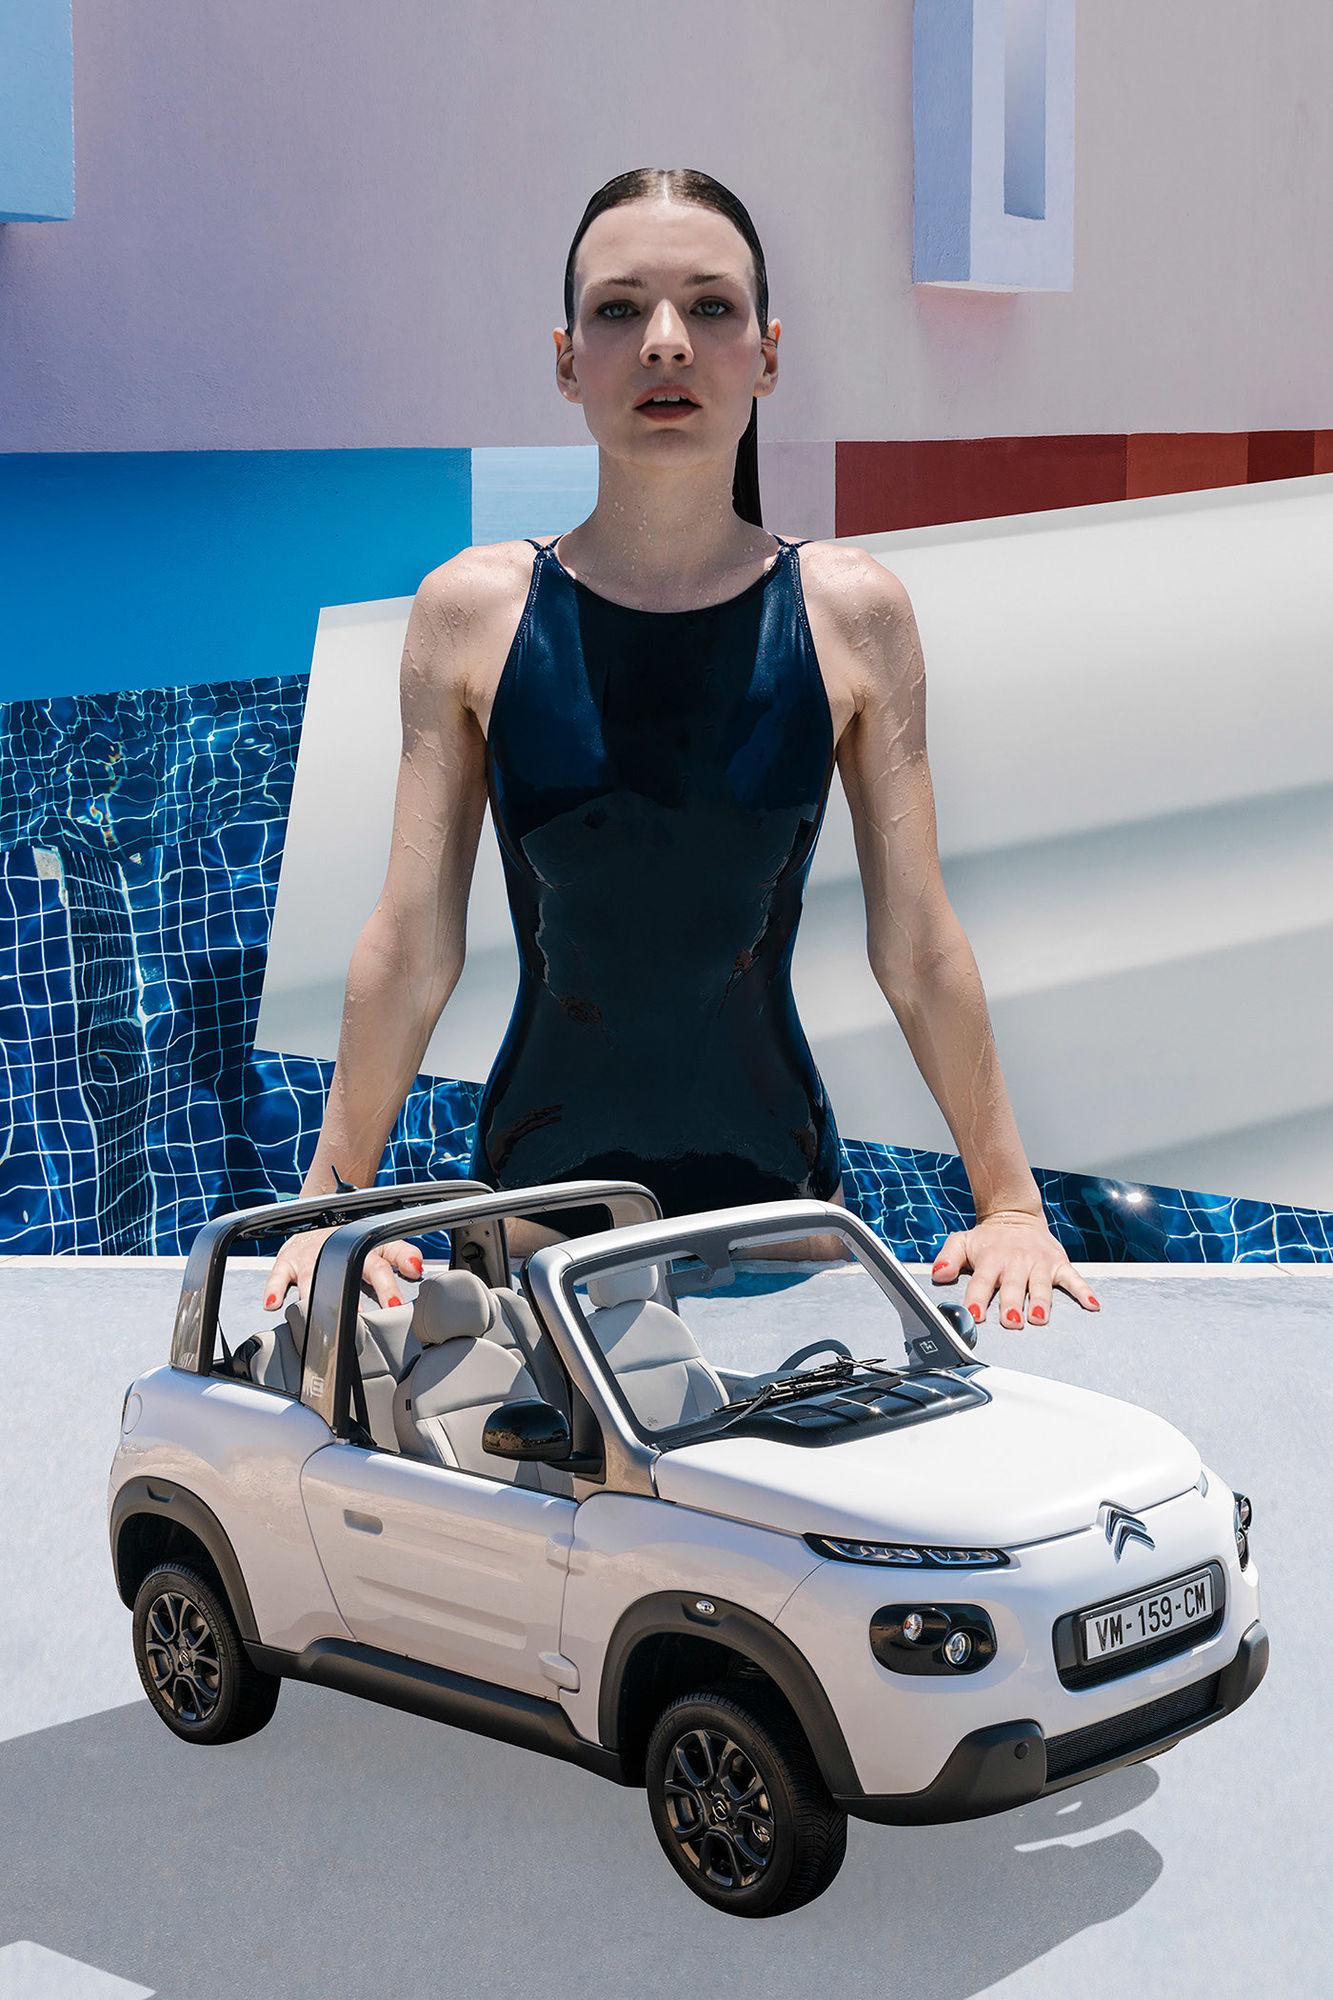 NEW Citroën E-Mehari by MAISON VIGNAUX REPRESENTED BY CONTIART